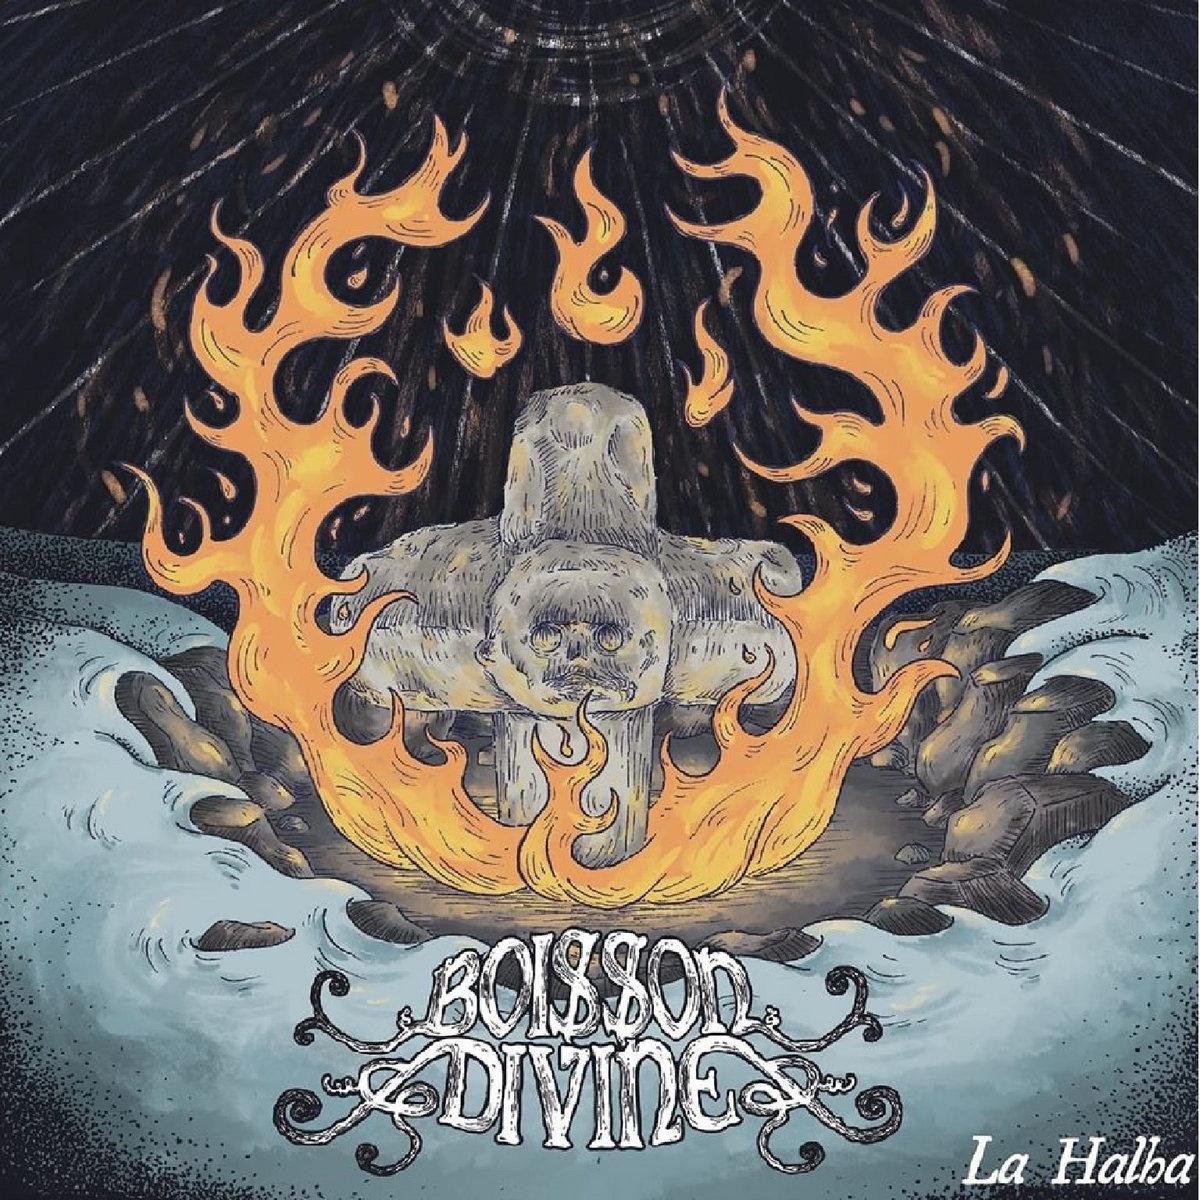 Boisson Divine: La Halha